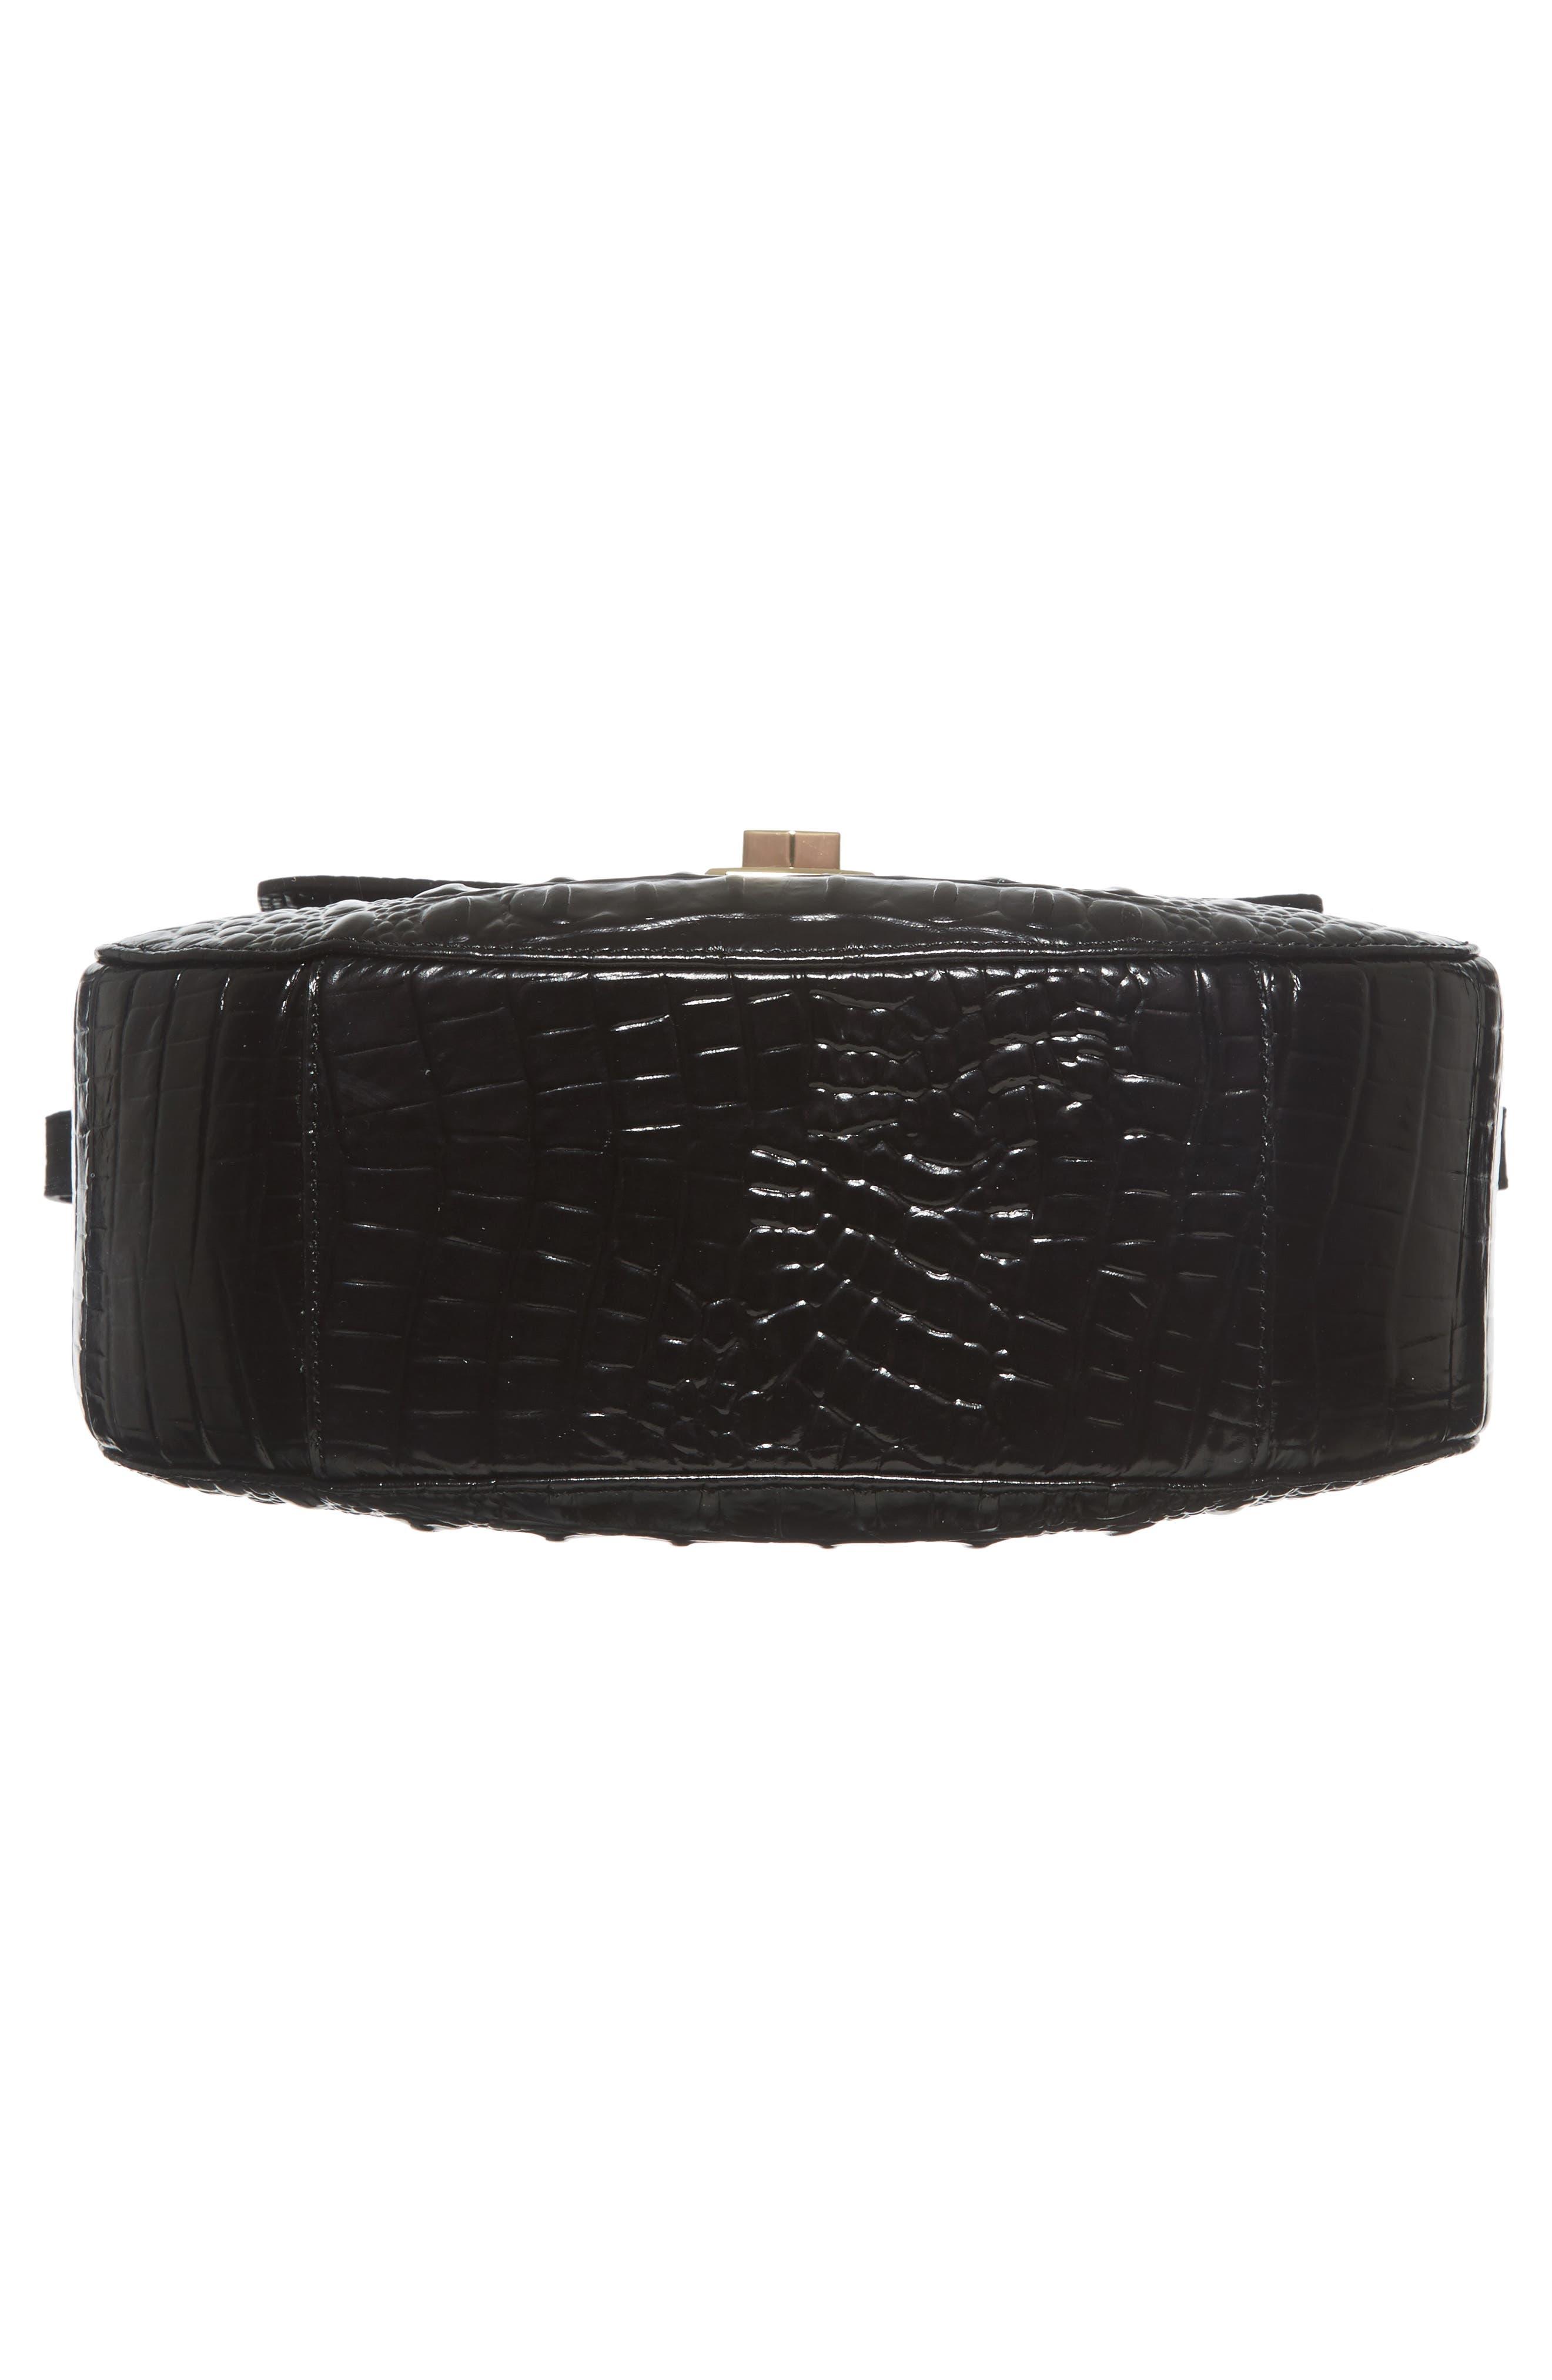 Melbourne - Lizzie Leather Crossbody Bag,                             Alternate thumbnail 26, color,